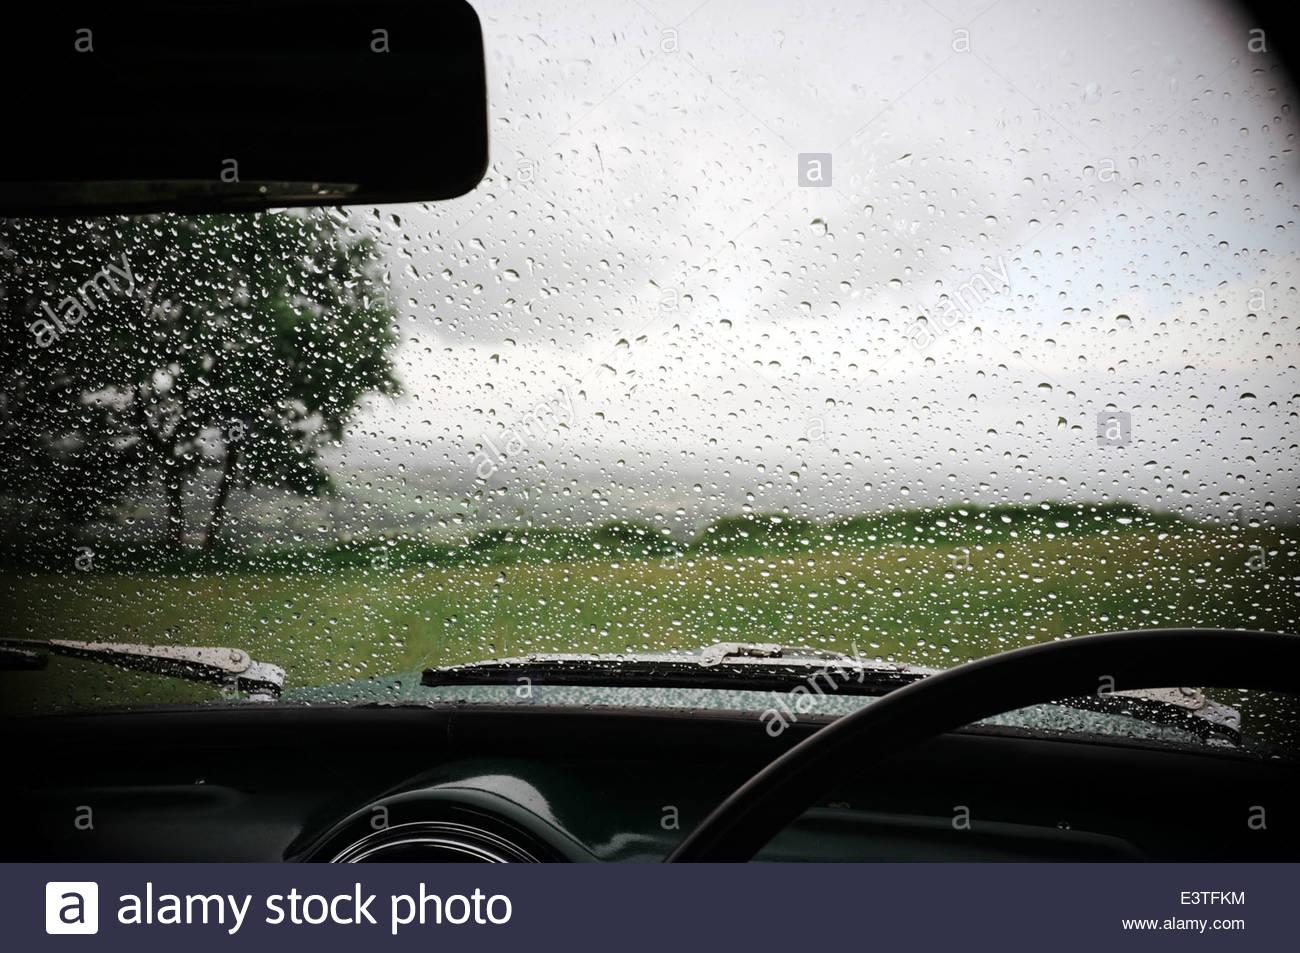 Rain On Car Window Stock Photos & Rain On Car Window Stock